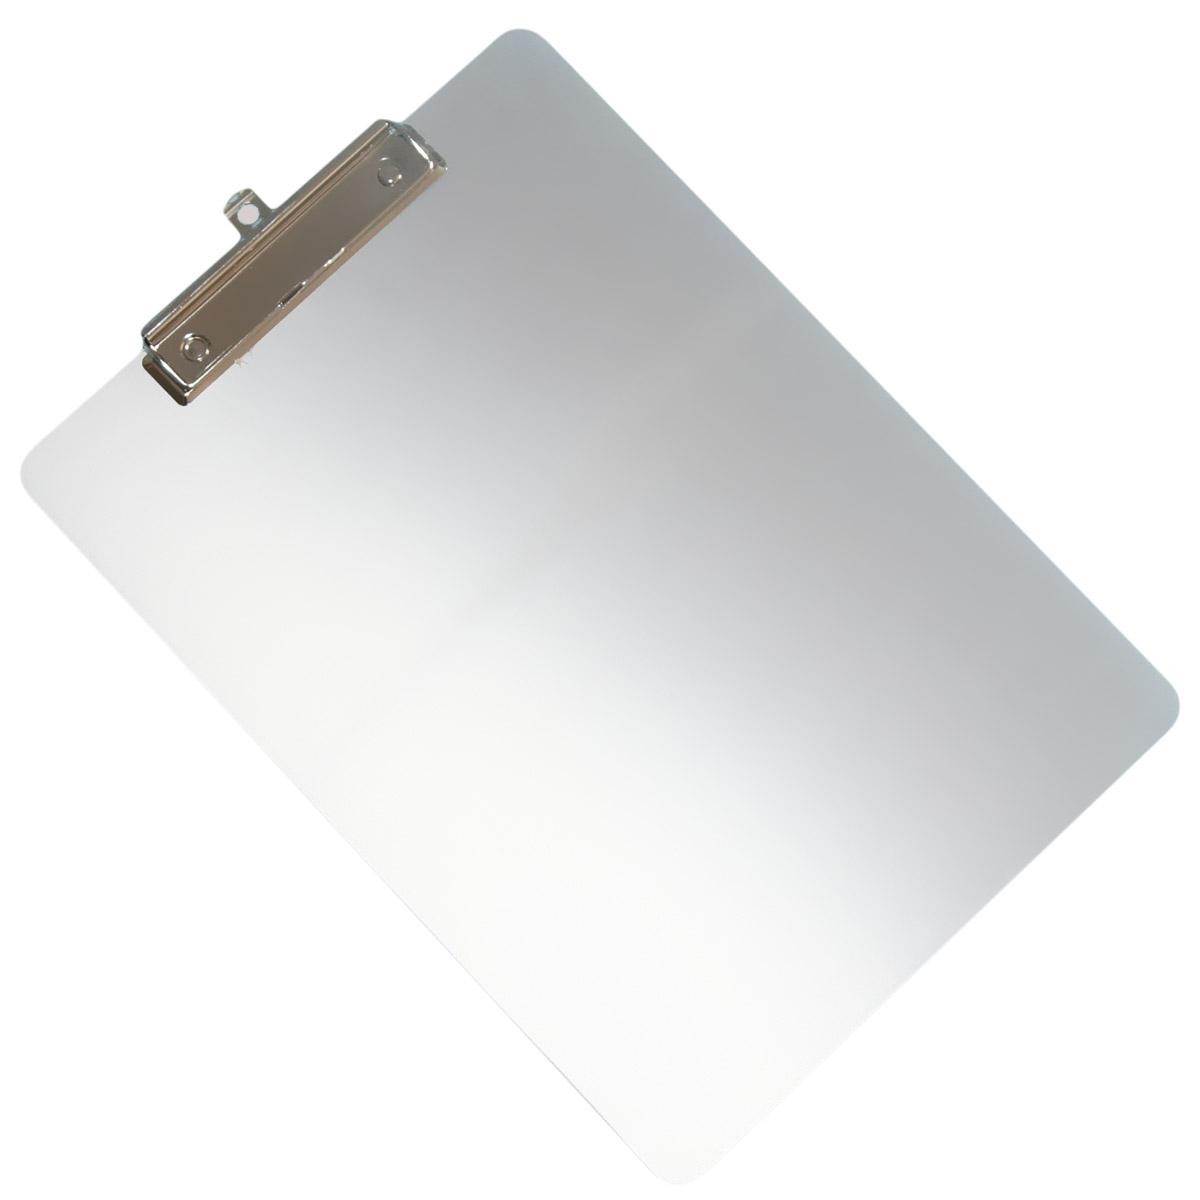 Aluminium clipboard for sublimation